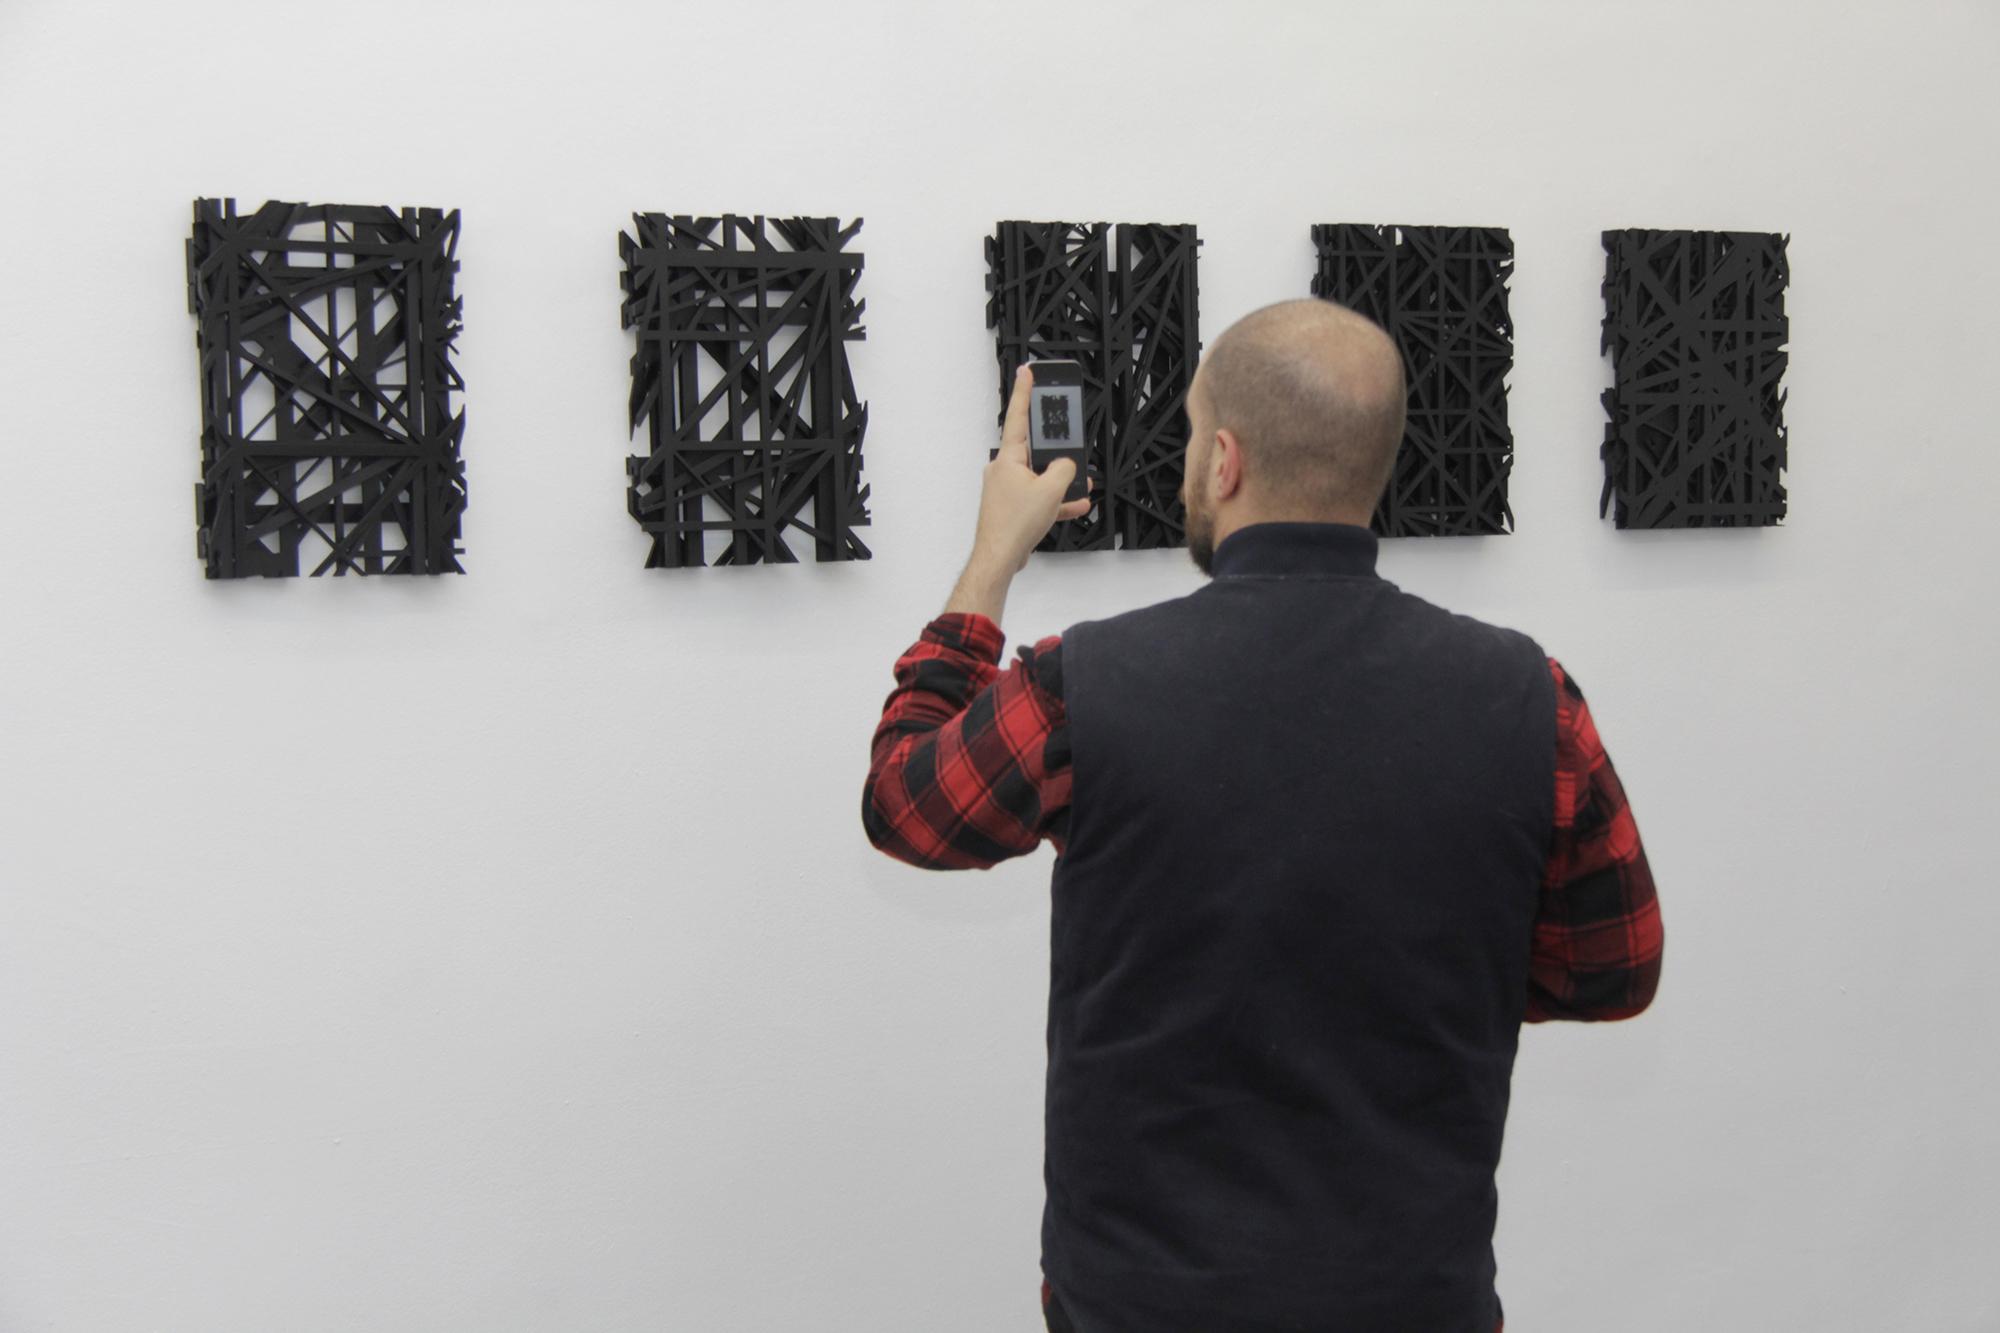 108, Arnaud Liard, Graphic Surgery, Moneyless, Nelio in mostra da Plastic Murs